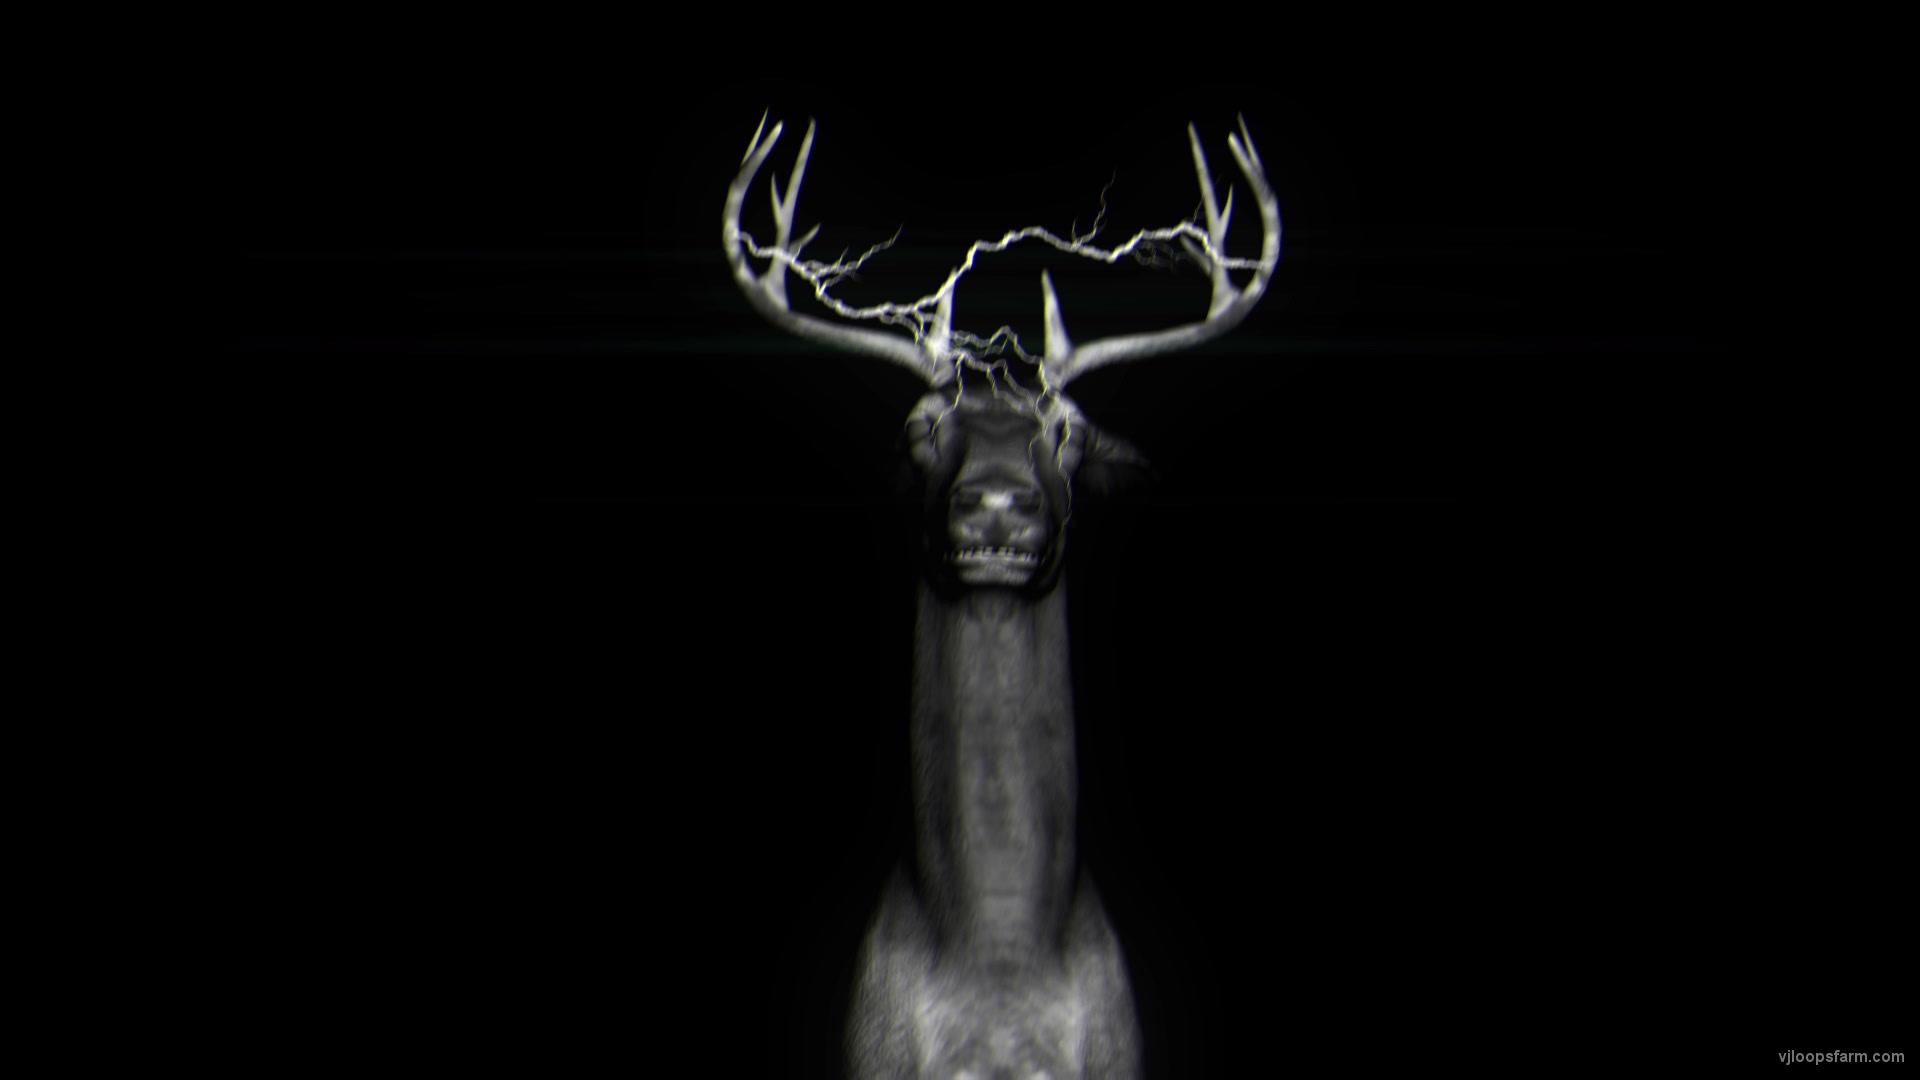 vj video background Dubstep-Neon-deers-Concert-decoration-VJ-Loop-LIMEART-FullHD_003